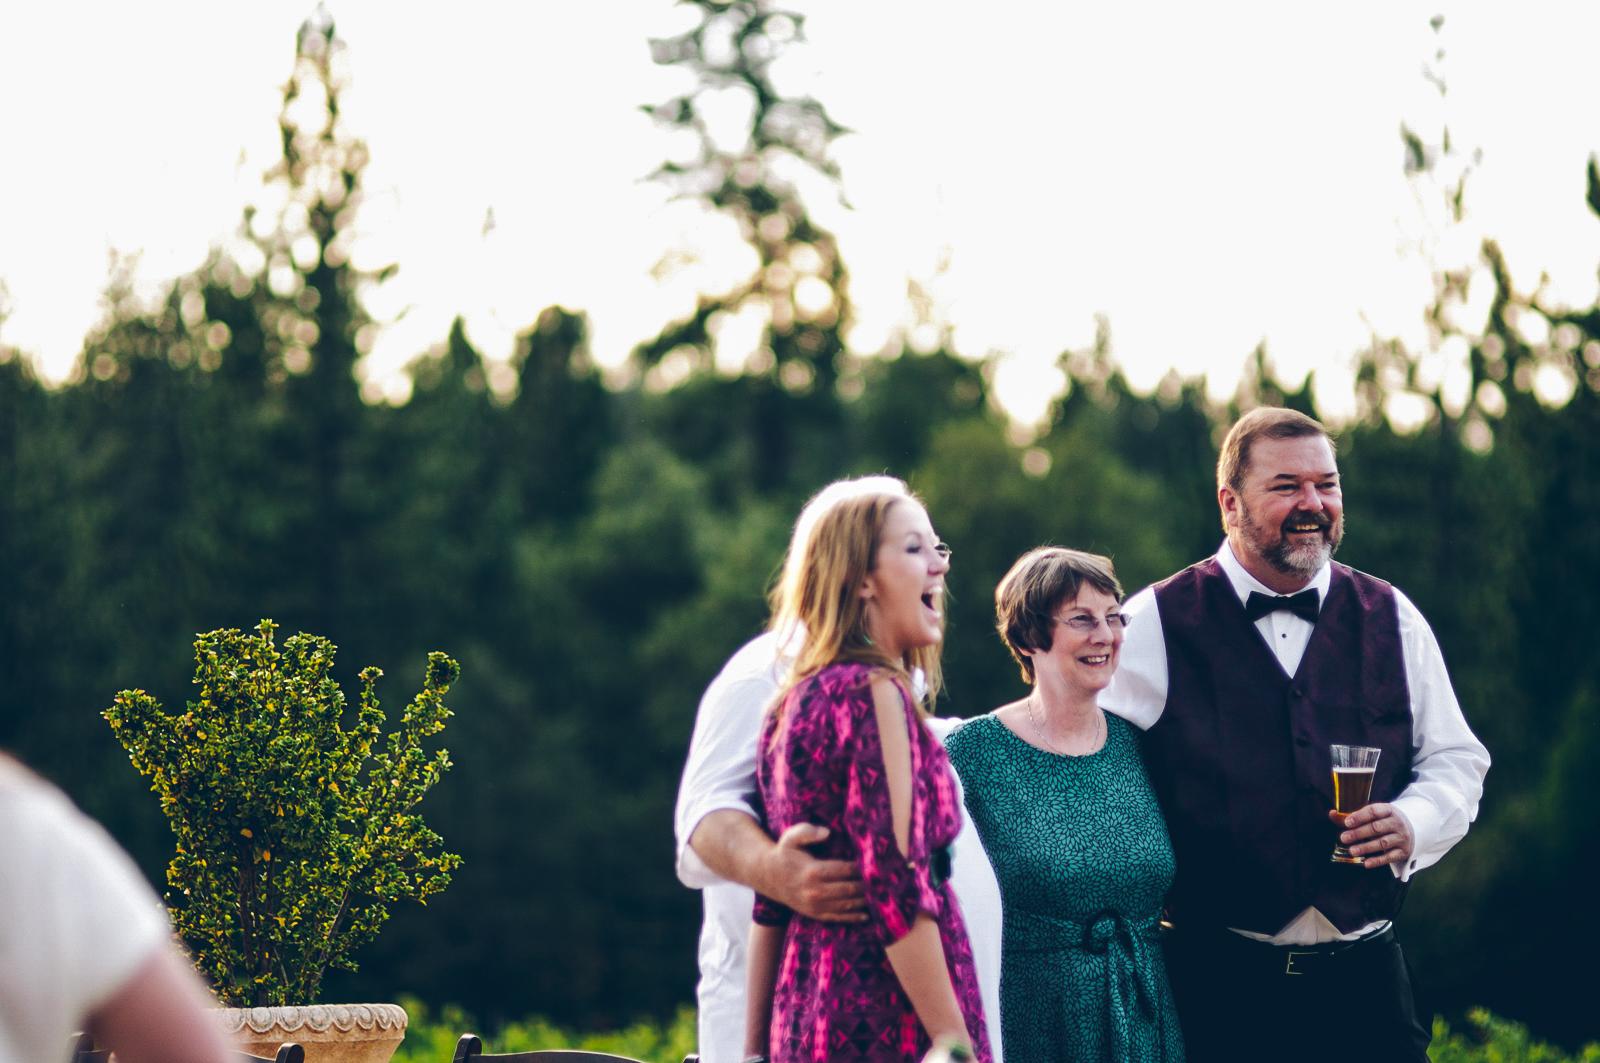 miraflores_winery_wedding_photography_ian_melissa_ebony_siovhan_bokeh_photography_68.jpg